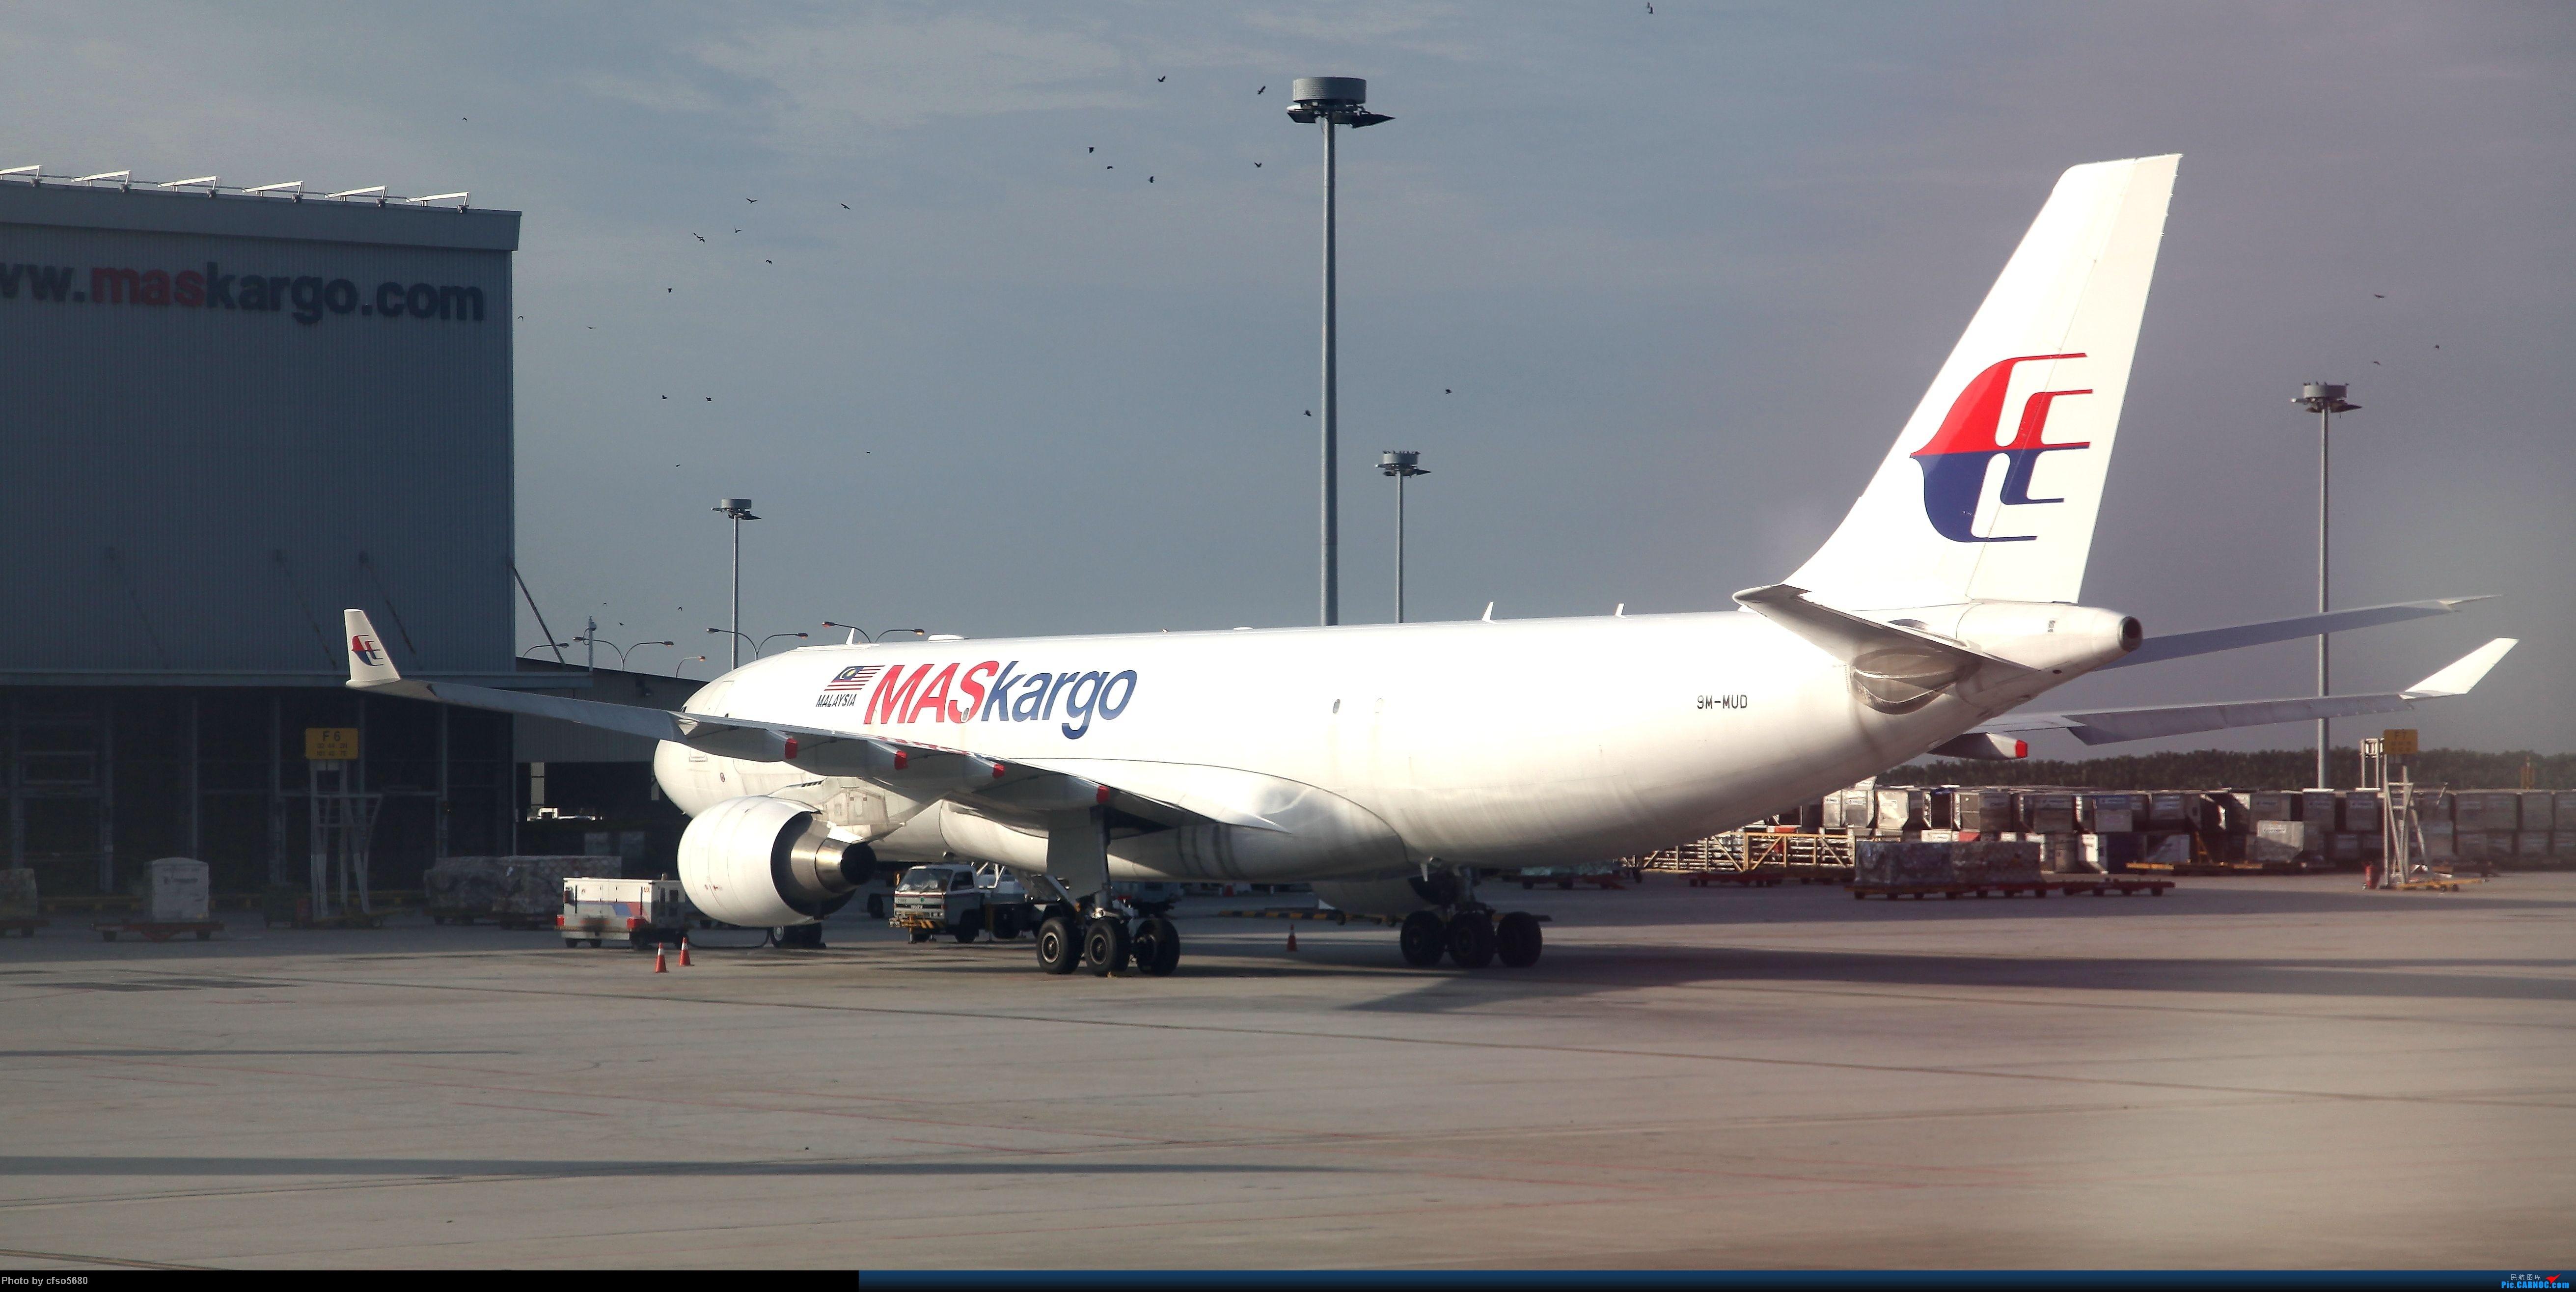 Re:2013大马拍机之旅,有彩绘、有380,飞机多多,惊喜多多。 AIRBUS A330-200 9M-MUD